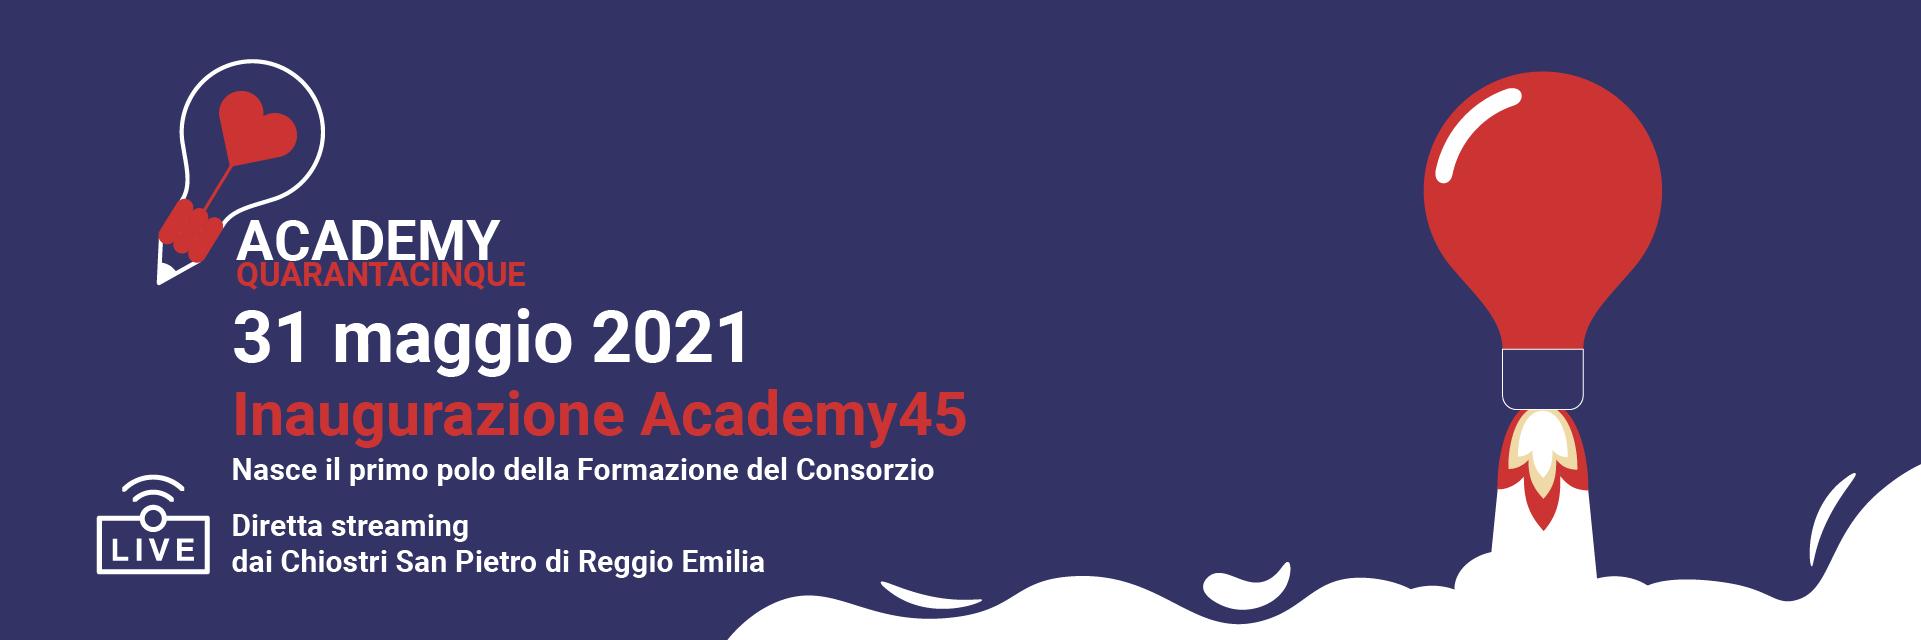 inaugurazione Academy Quarantacinque